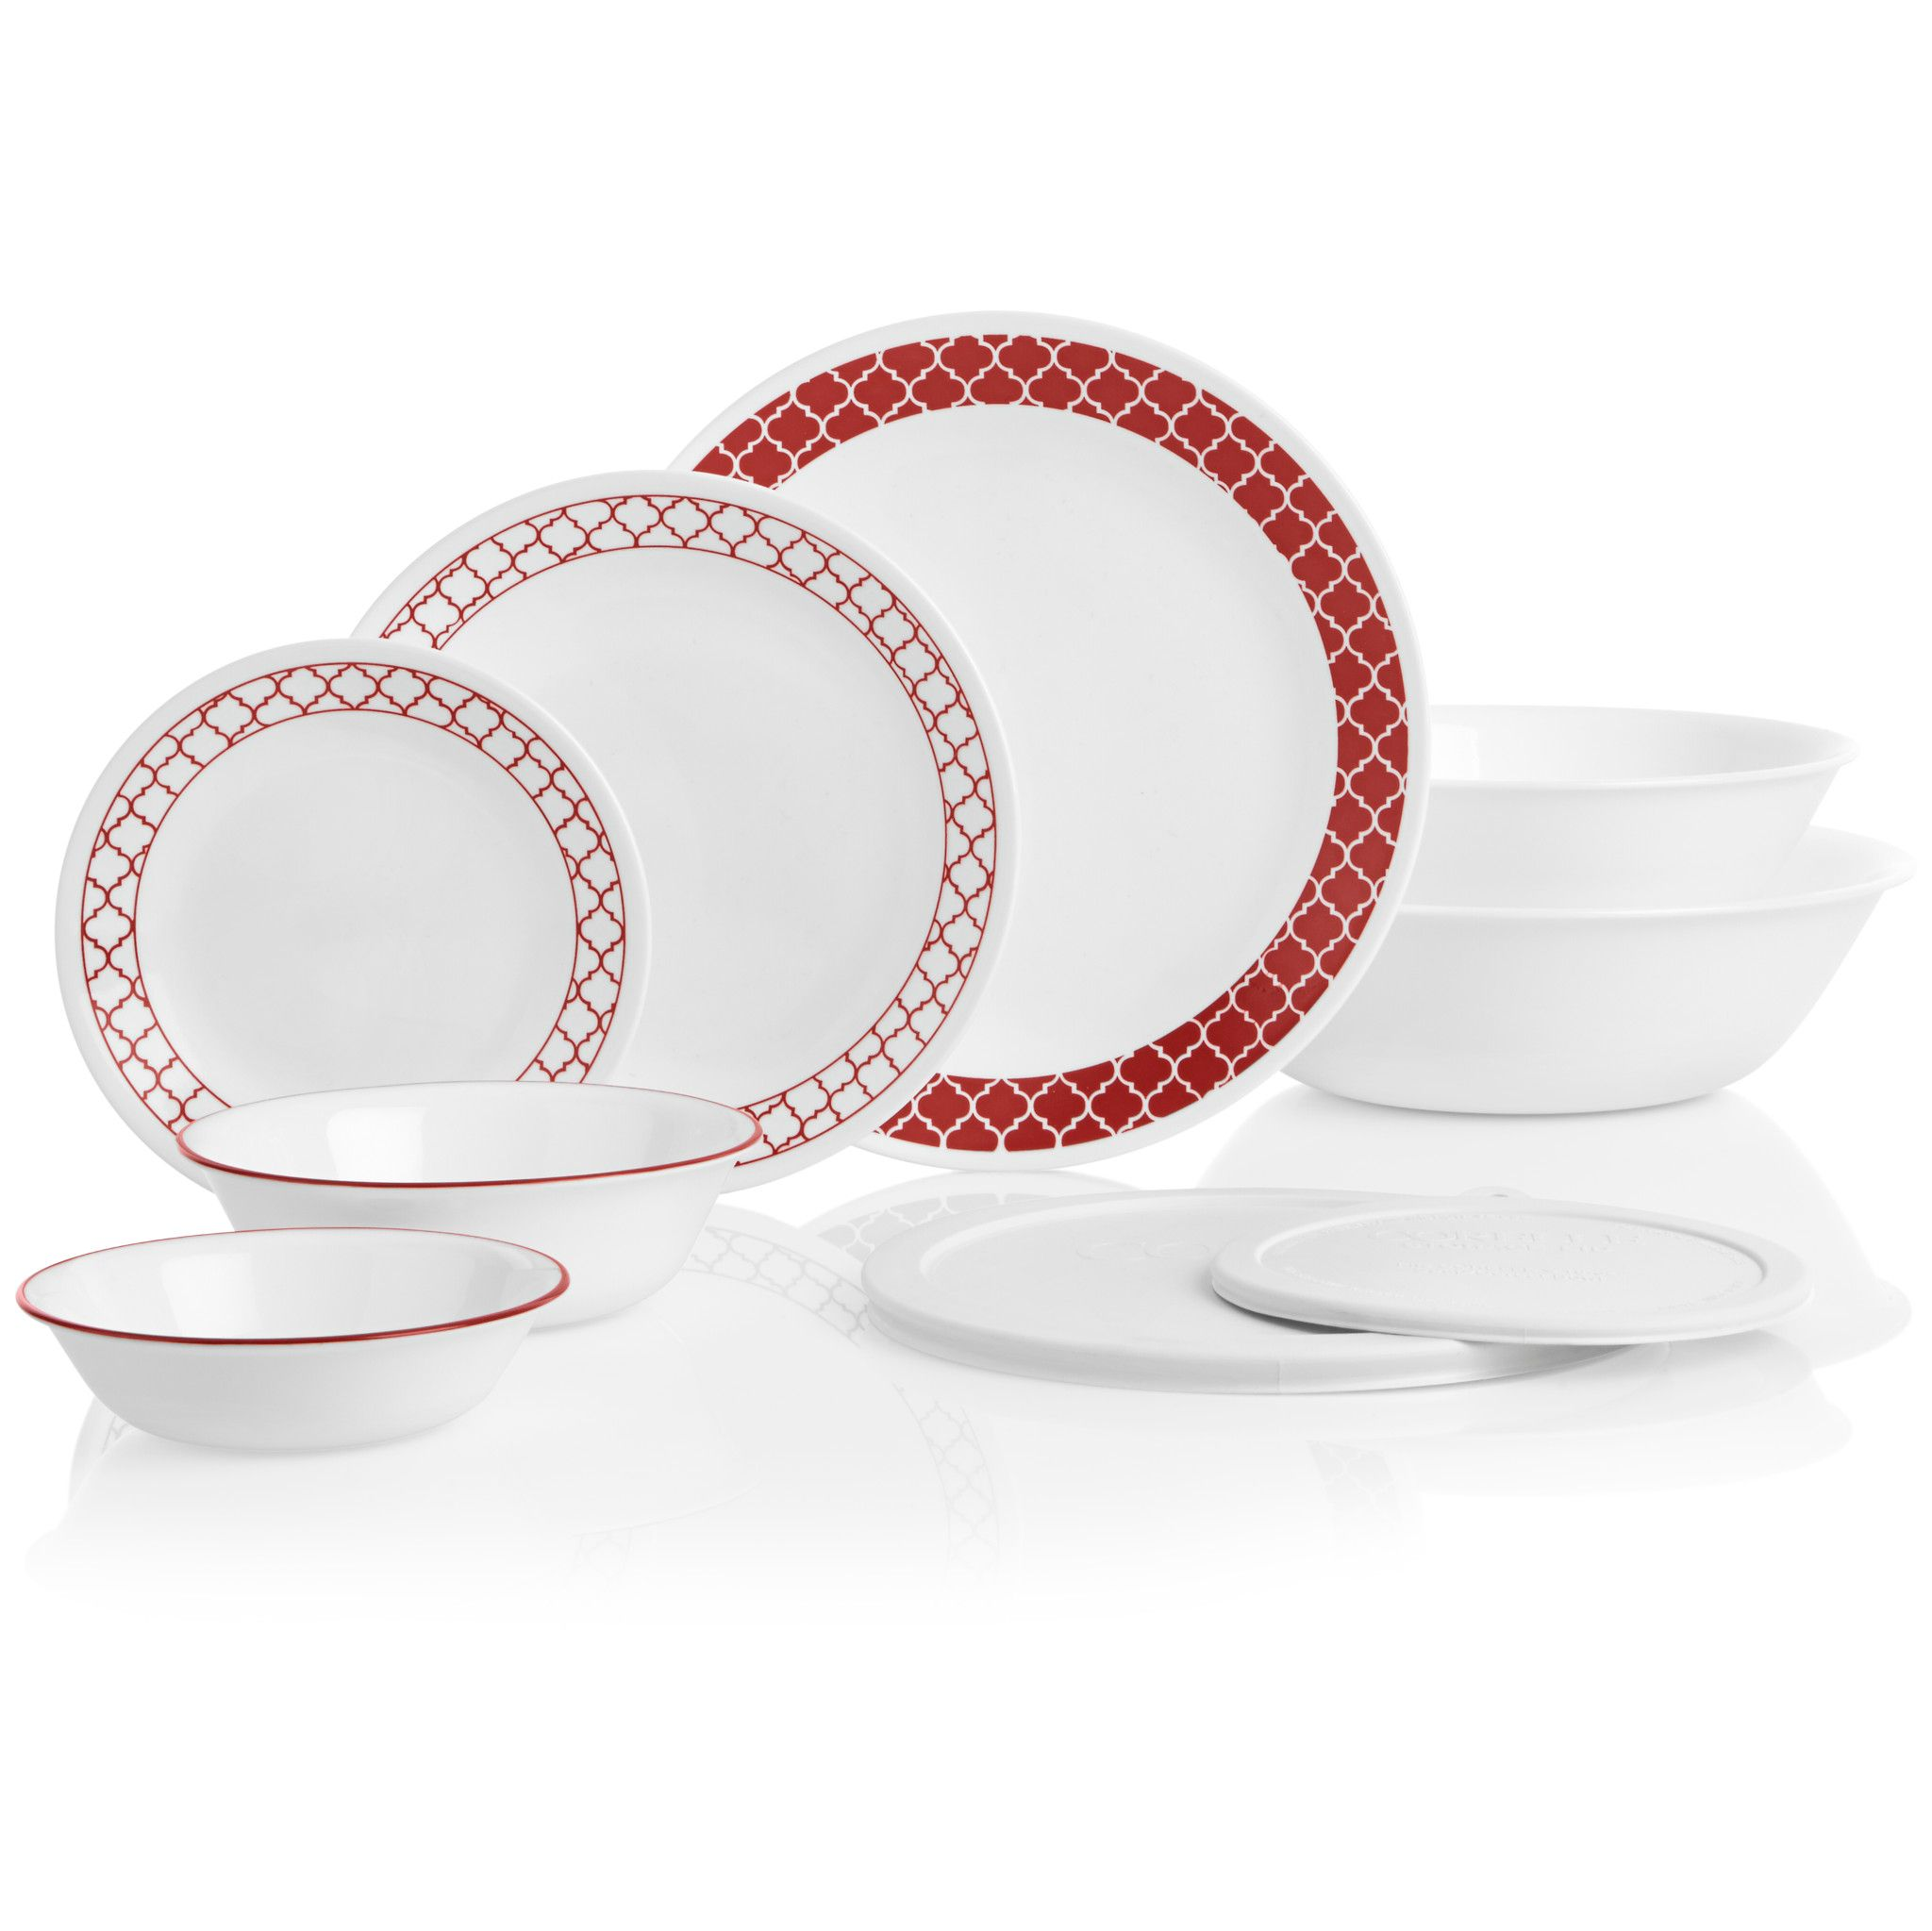 Corelle_Livingware_Crimson_Trellis_78pc_Dinnerware_Set